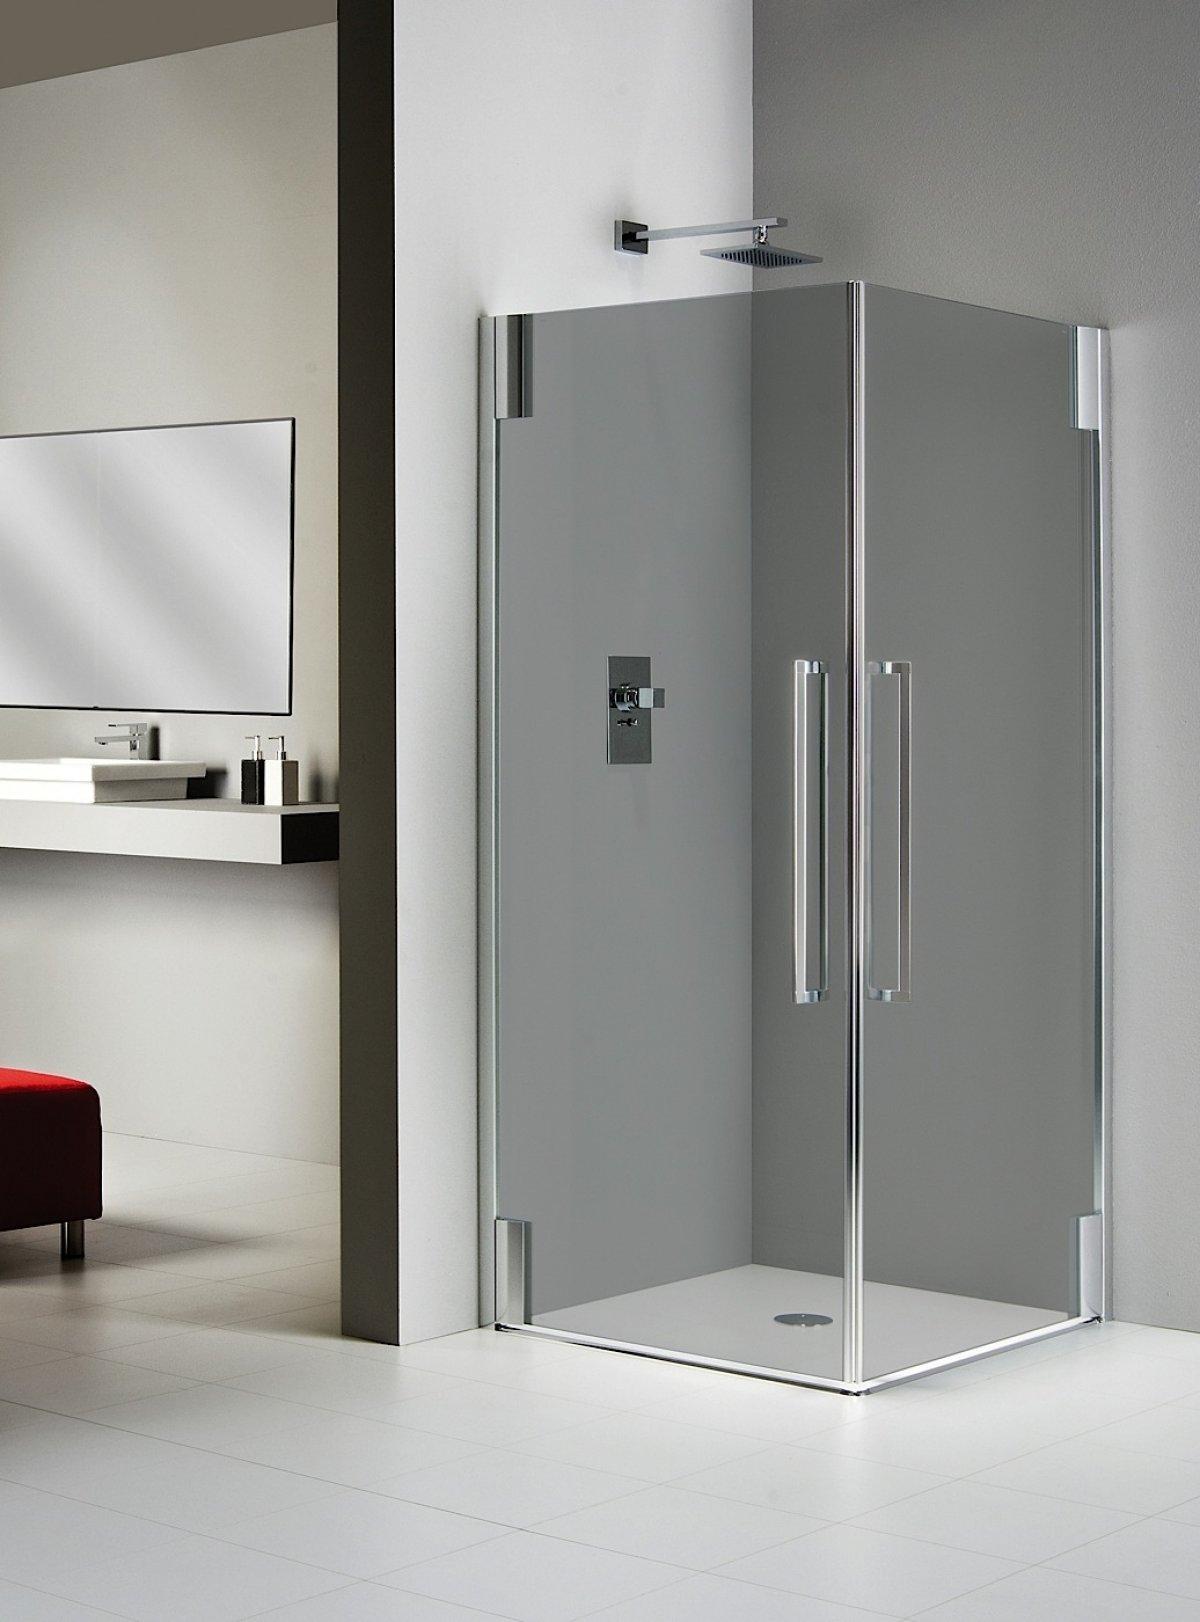 princess 4000 duka. Black Bedroom Furniture Sets. Home Design Ideas